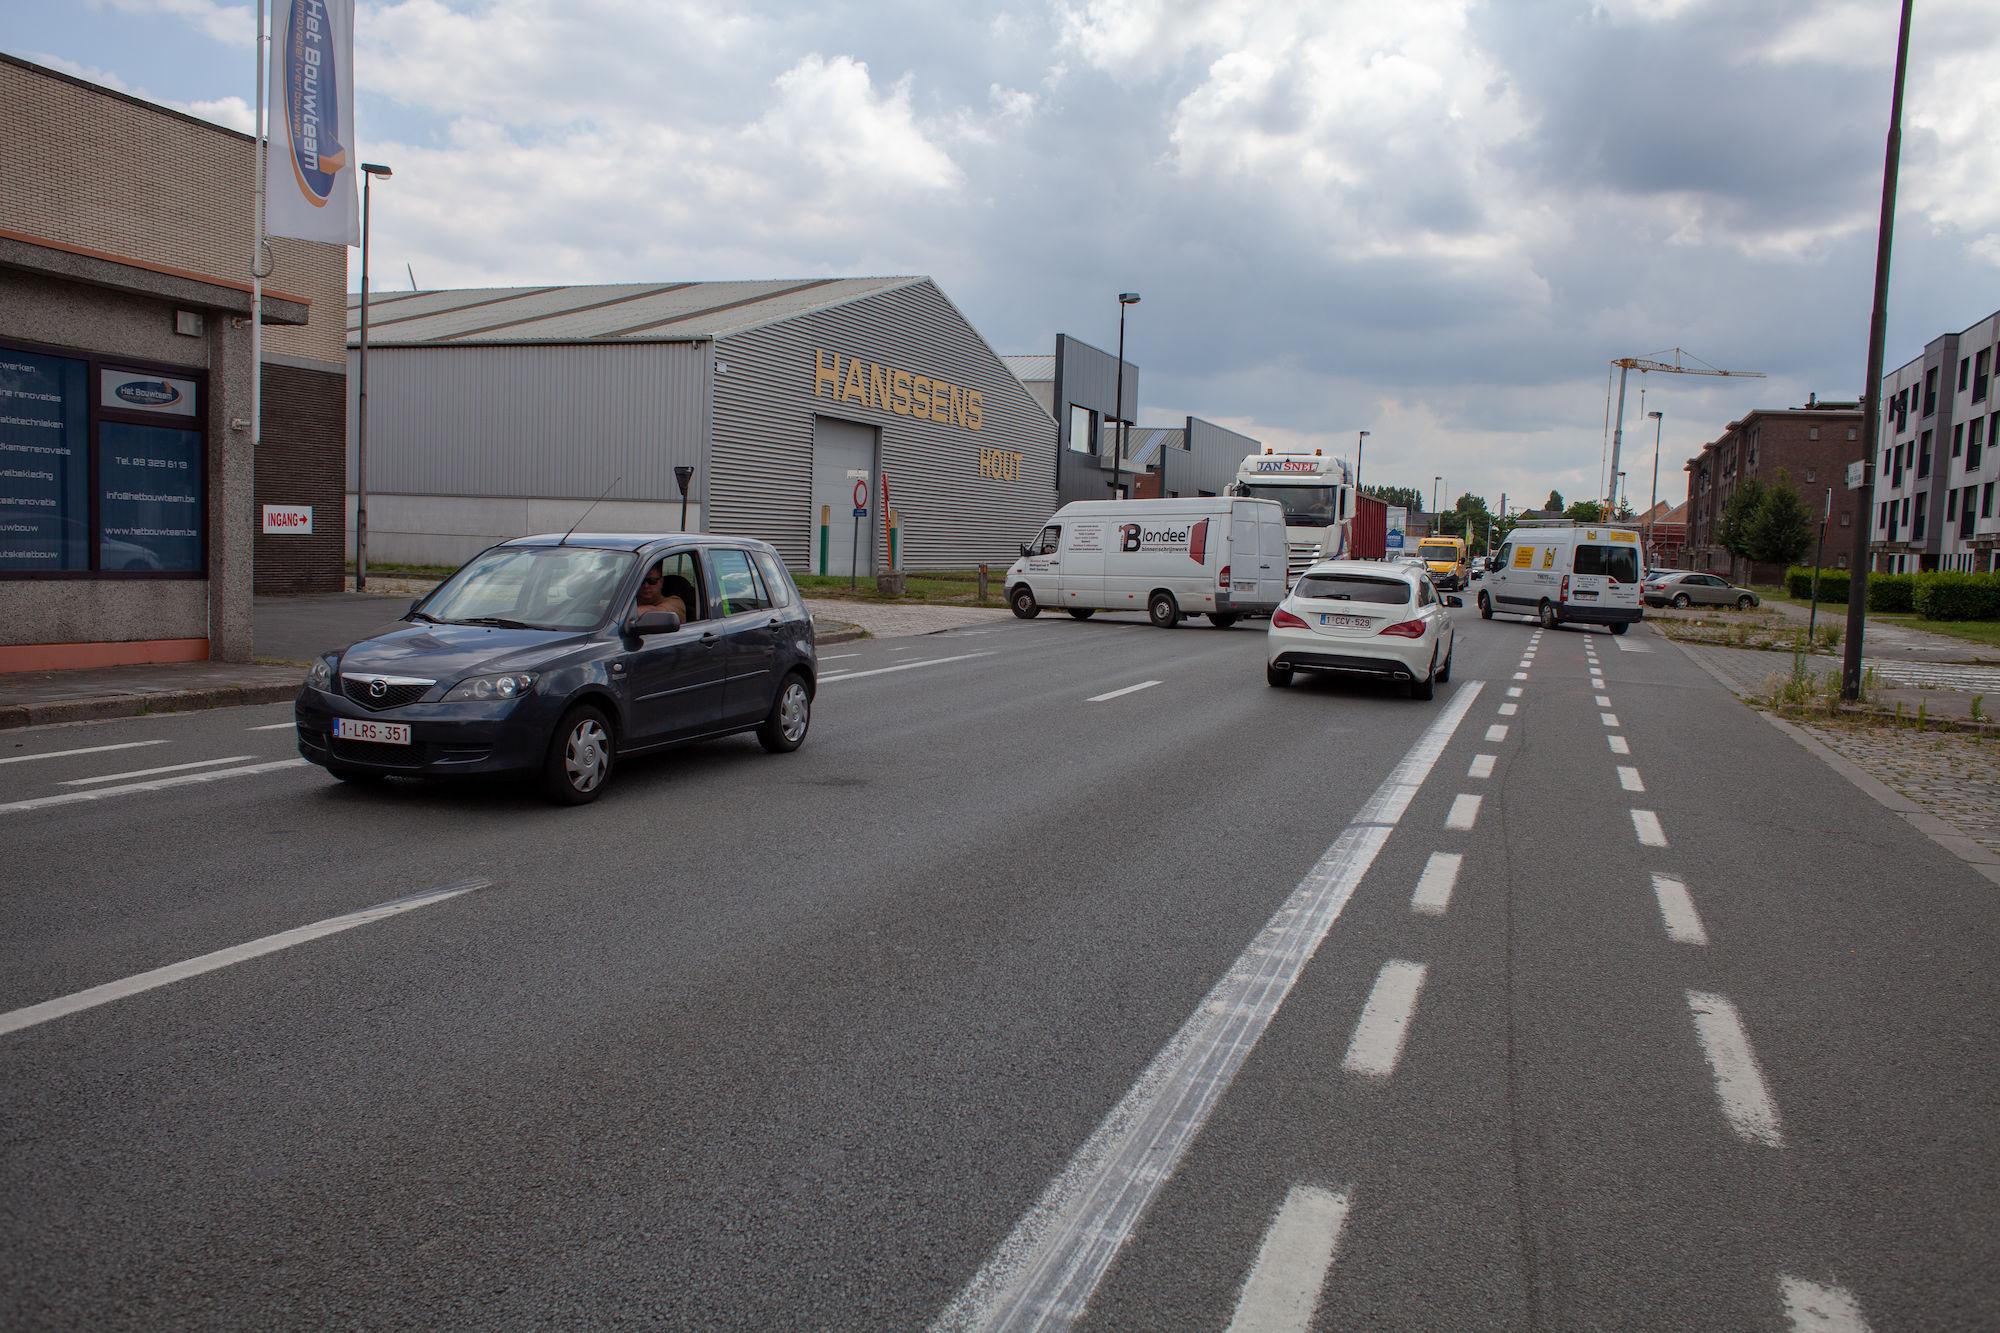 2019-07-02 Muide Meulestede prospectie Wannes_stadsvernieuwing_IMG_0321-3.jpg